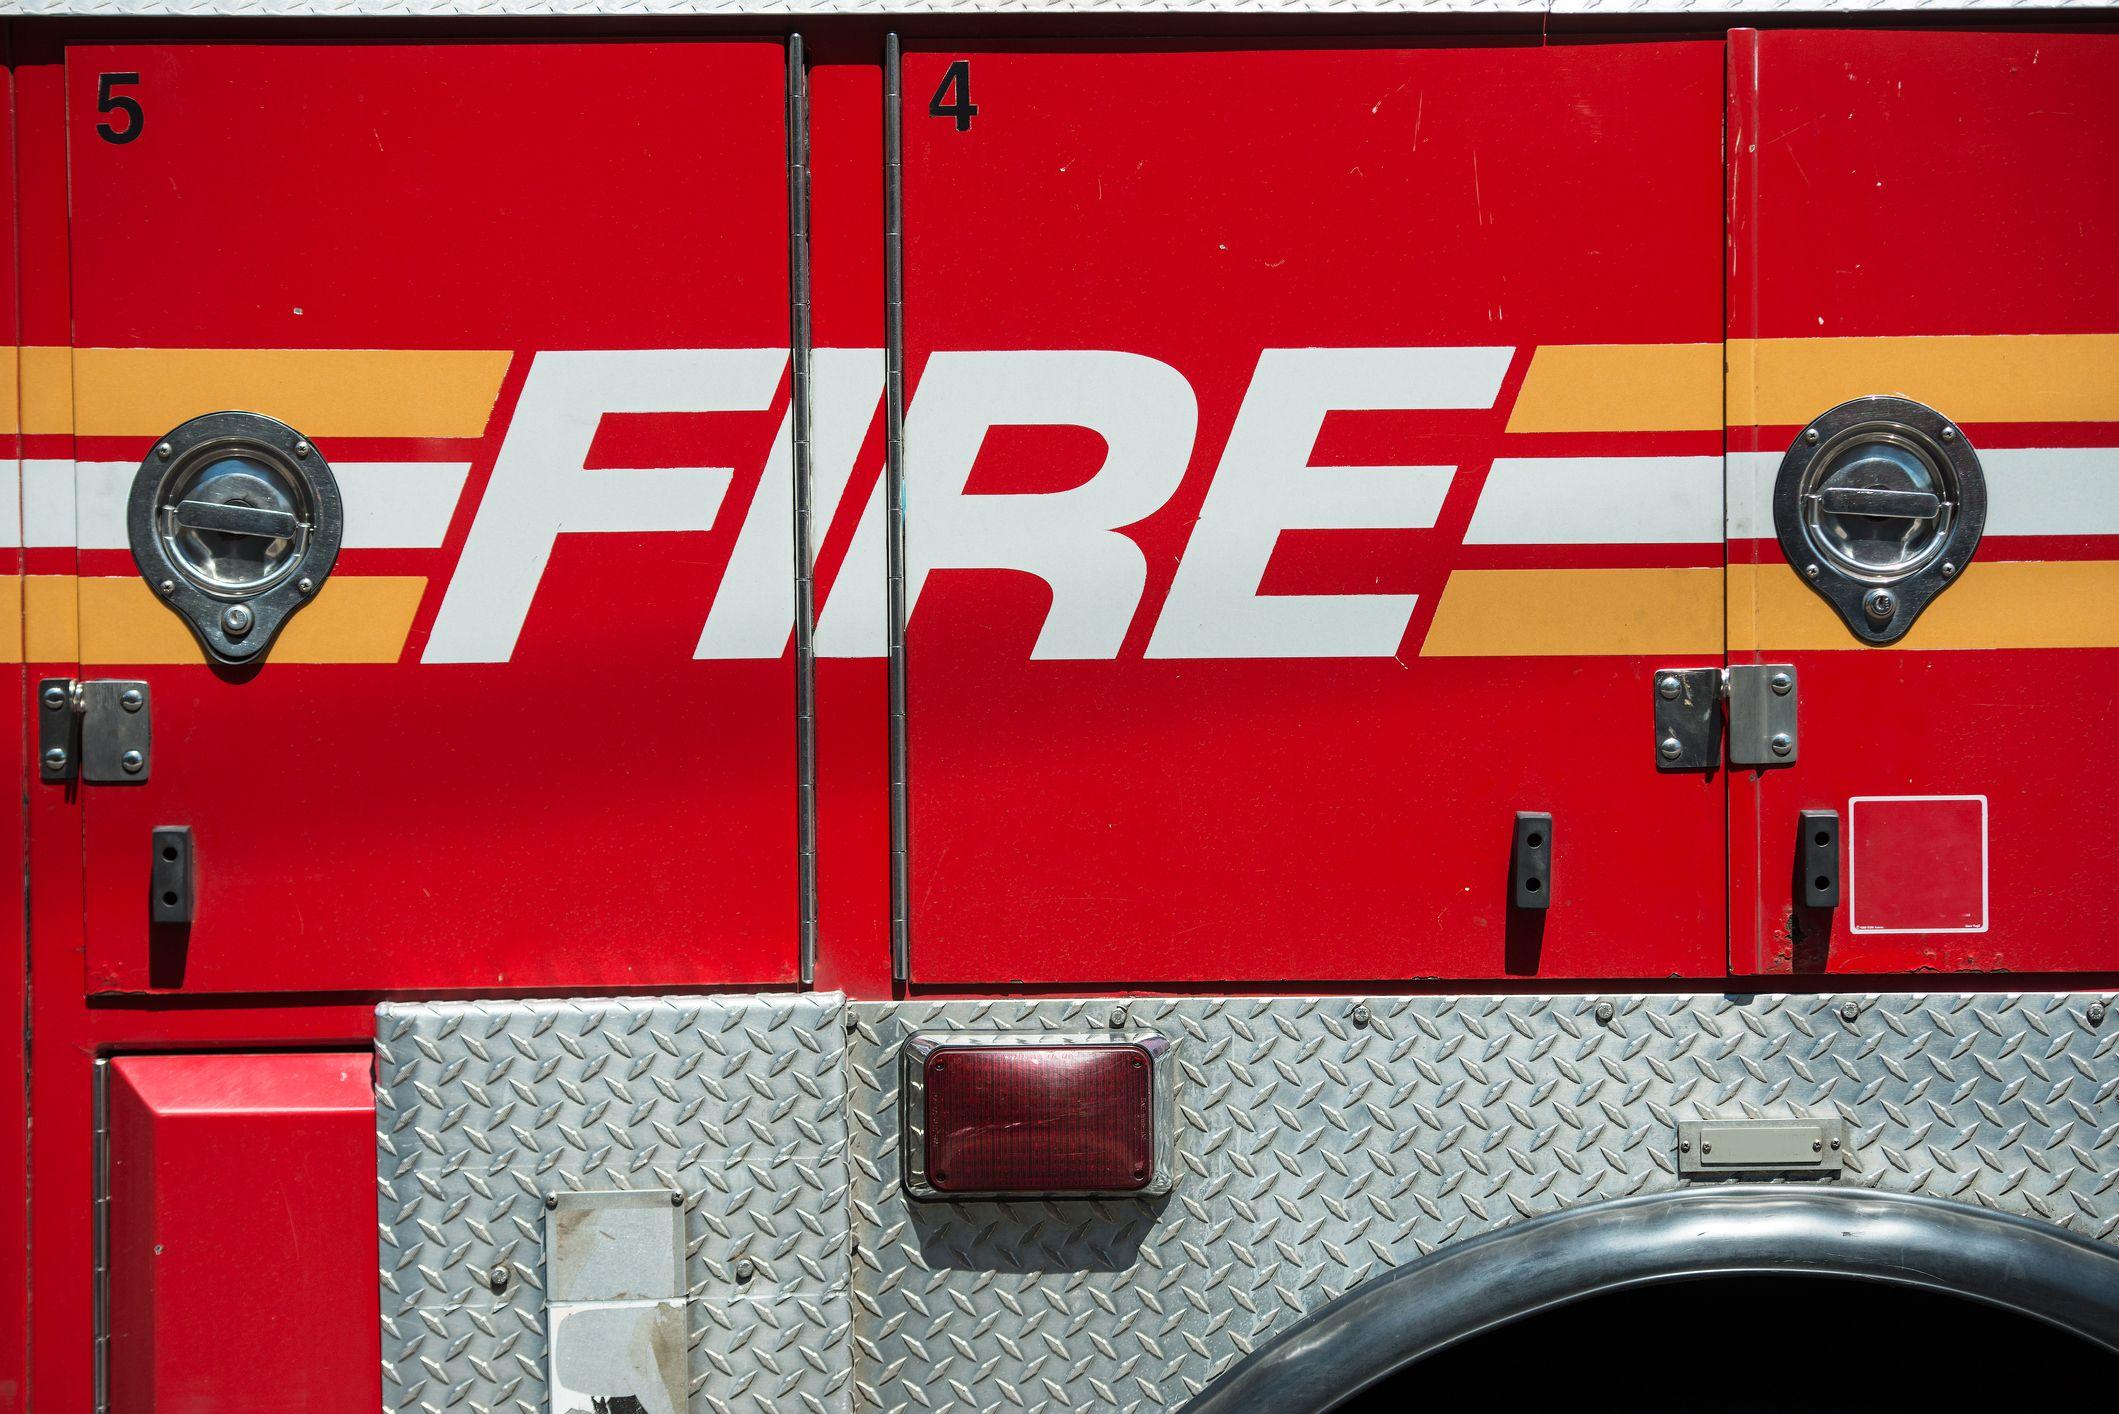 Firefighter, Death, Bridge, New York City, Brooklyn, Flatbush, Belt Parkway